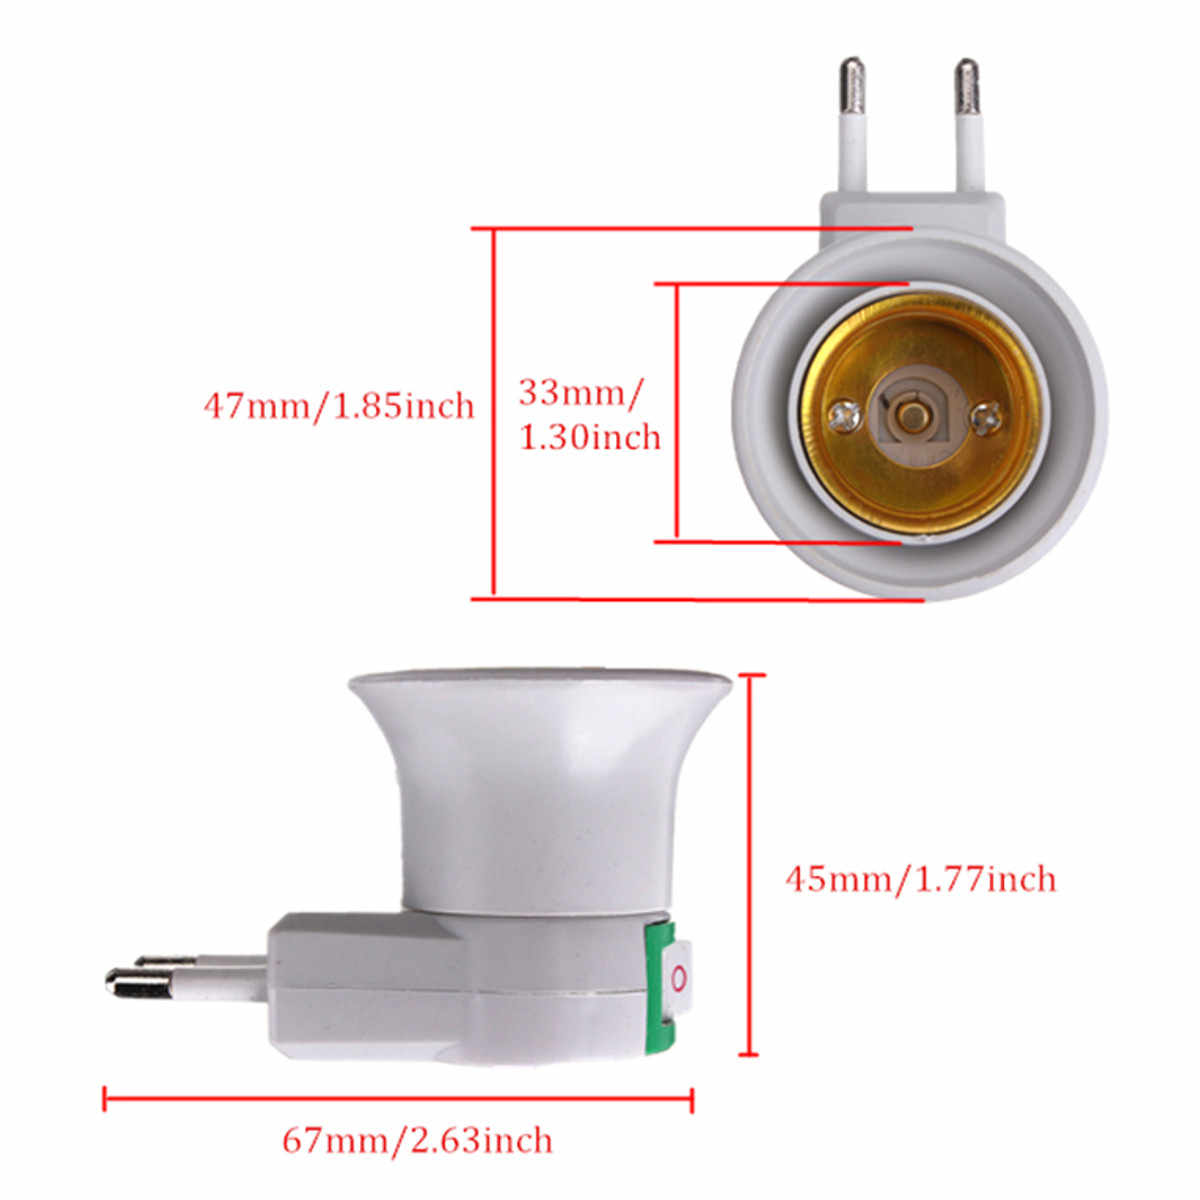 Hot E27 Lamp Base Socket 250V 6A White EU Plug Night Light With Power On Off Control Switch Light Base